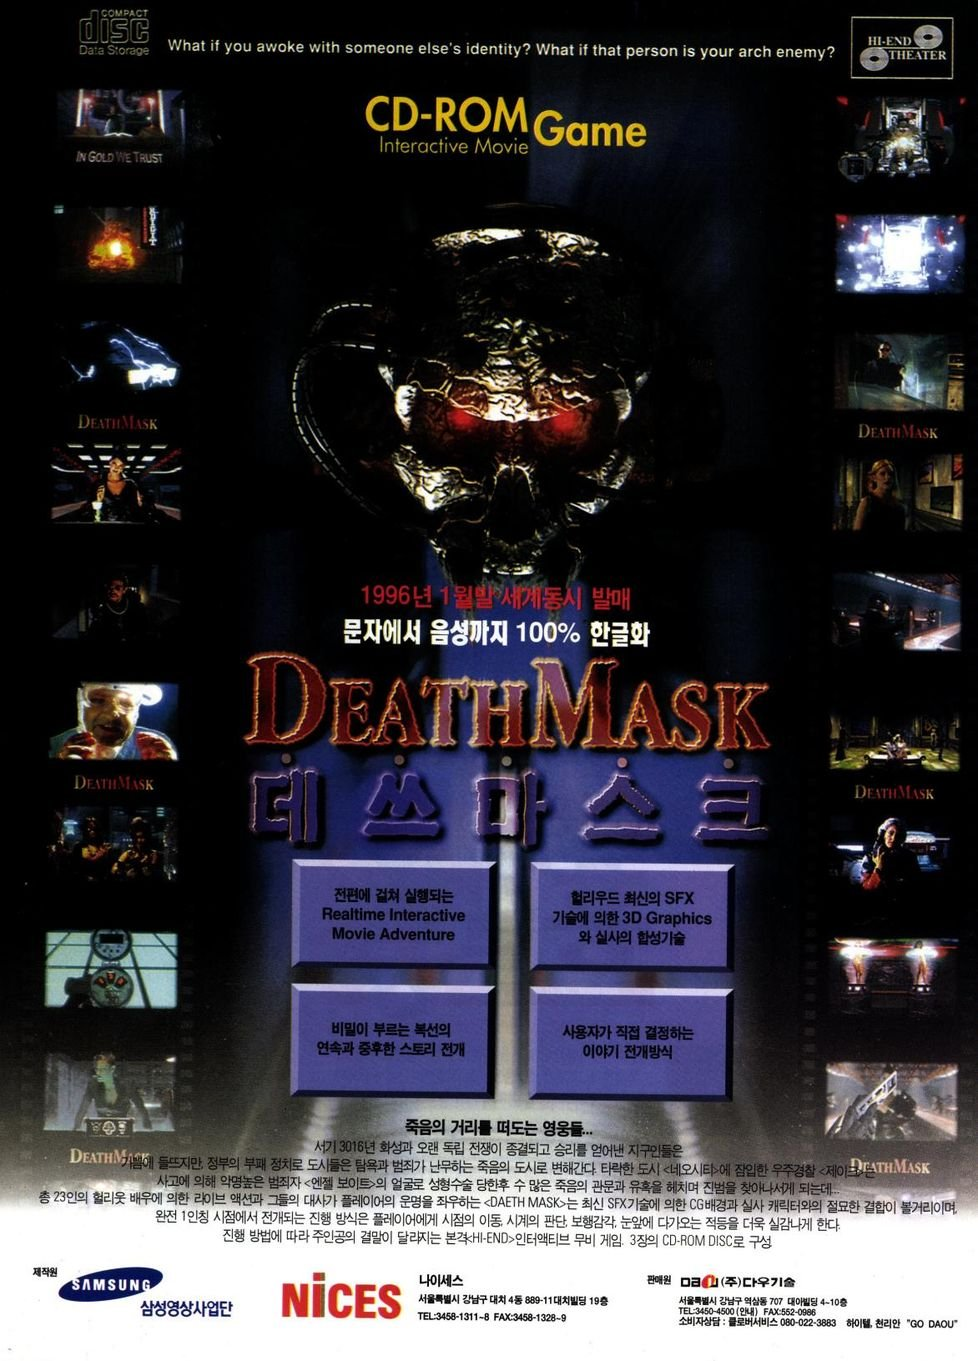 Angel Devoid: Face of the Enemy (Death Mask) (Korea)